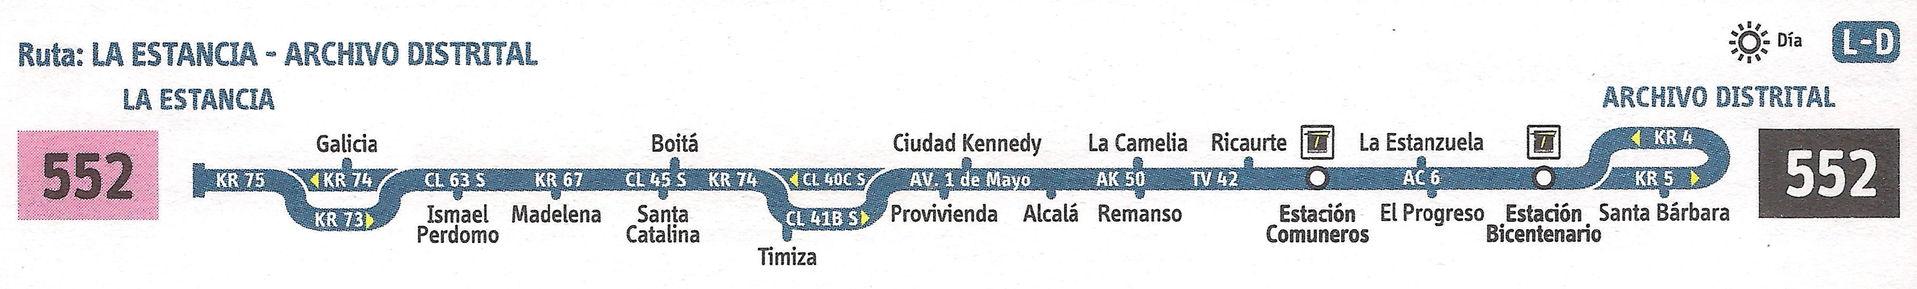 Ruta SITP: 552 Galicia ↔ Centro [Urbana] 5